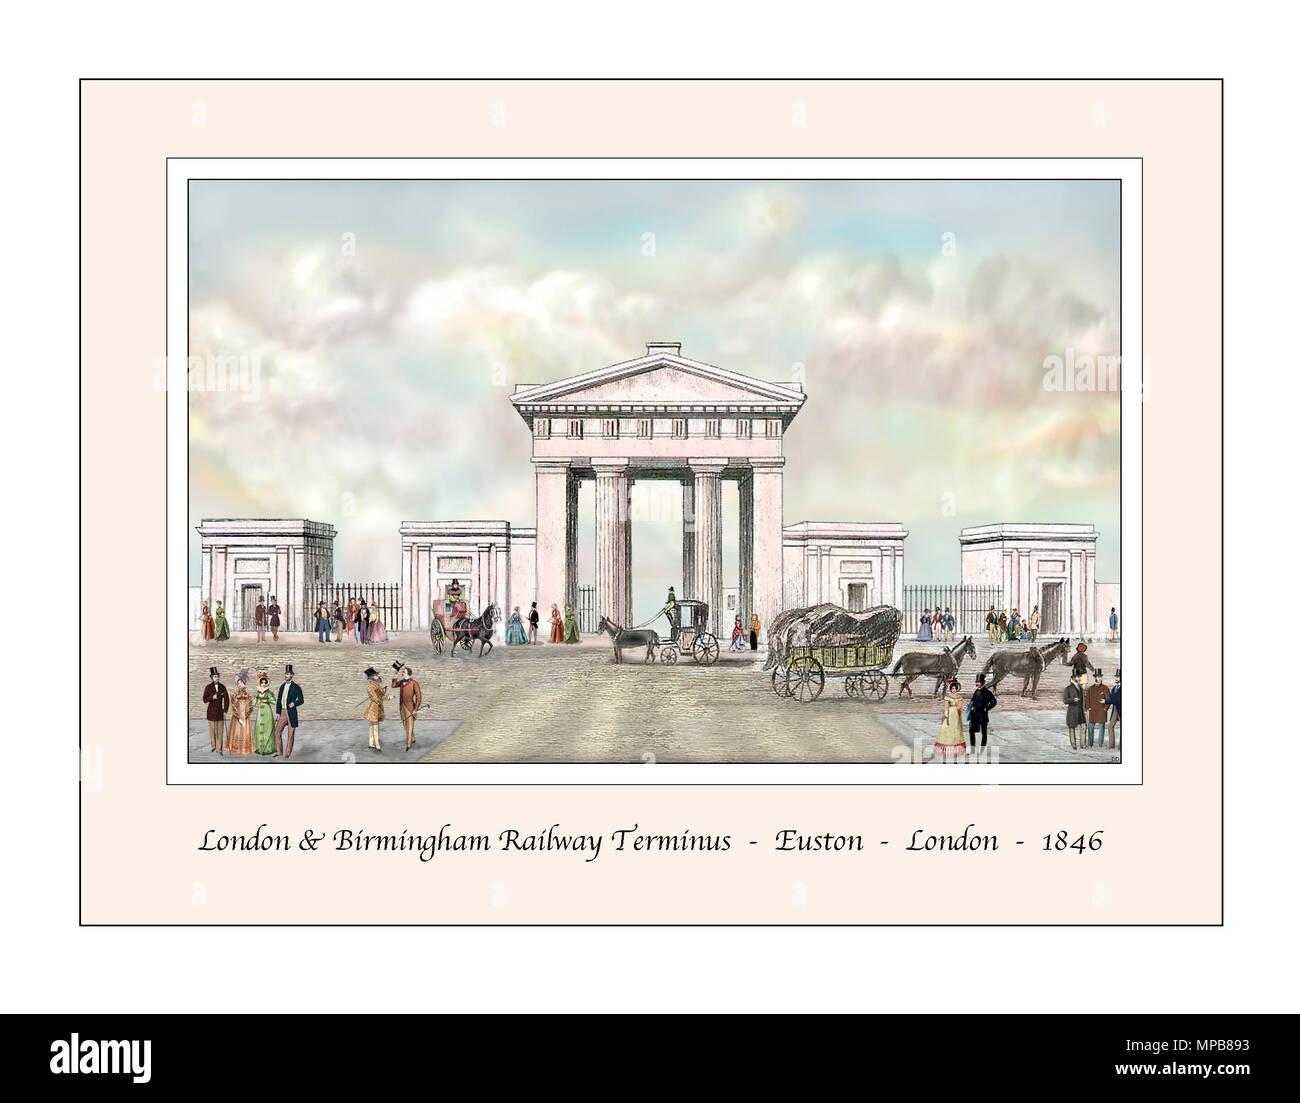 Euston Station London Original Design based on a 19th century Engraving Stock Photo